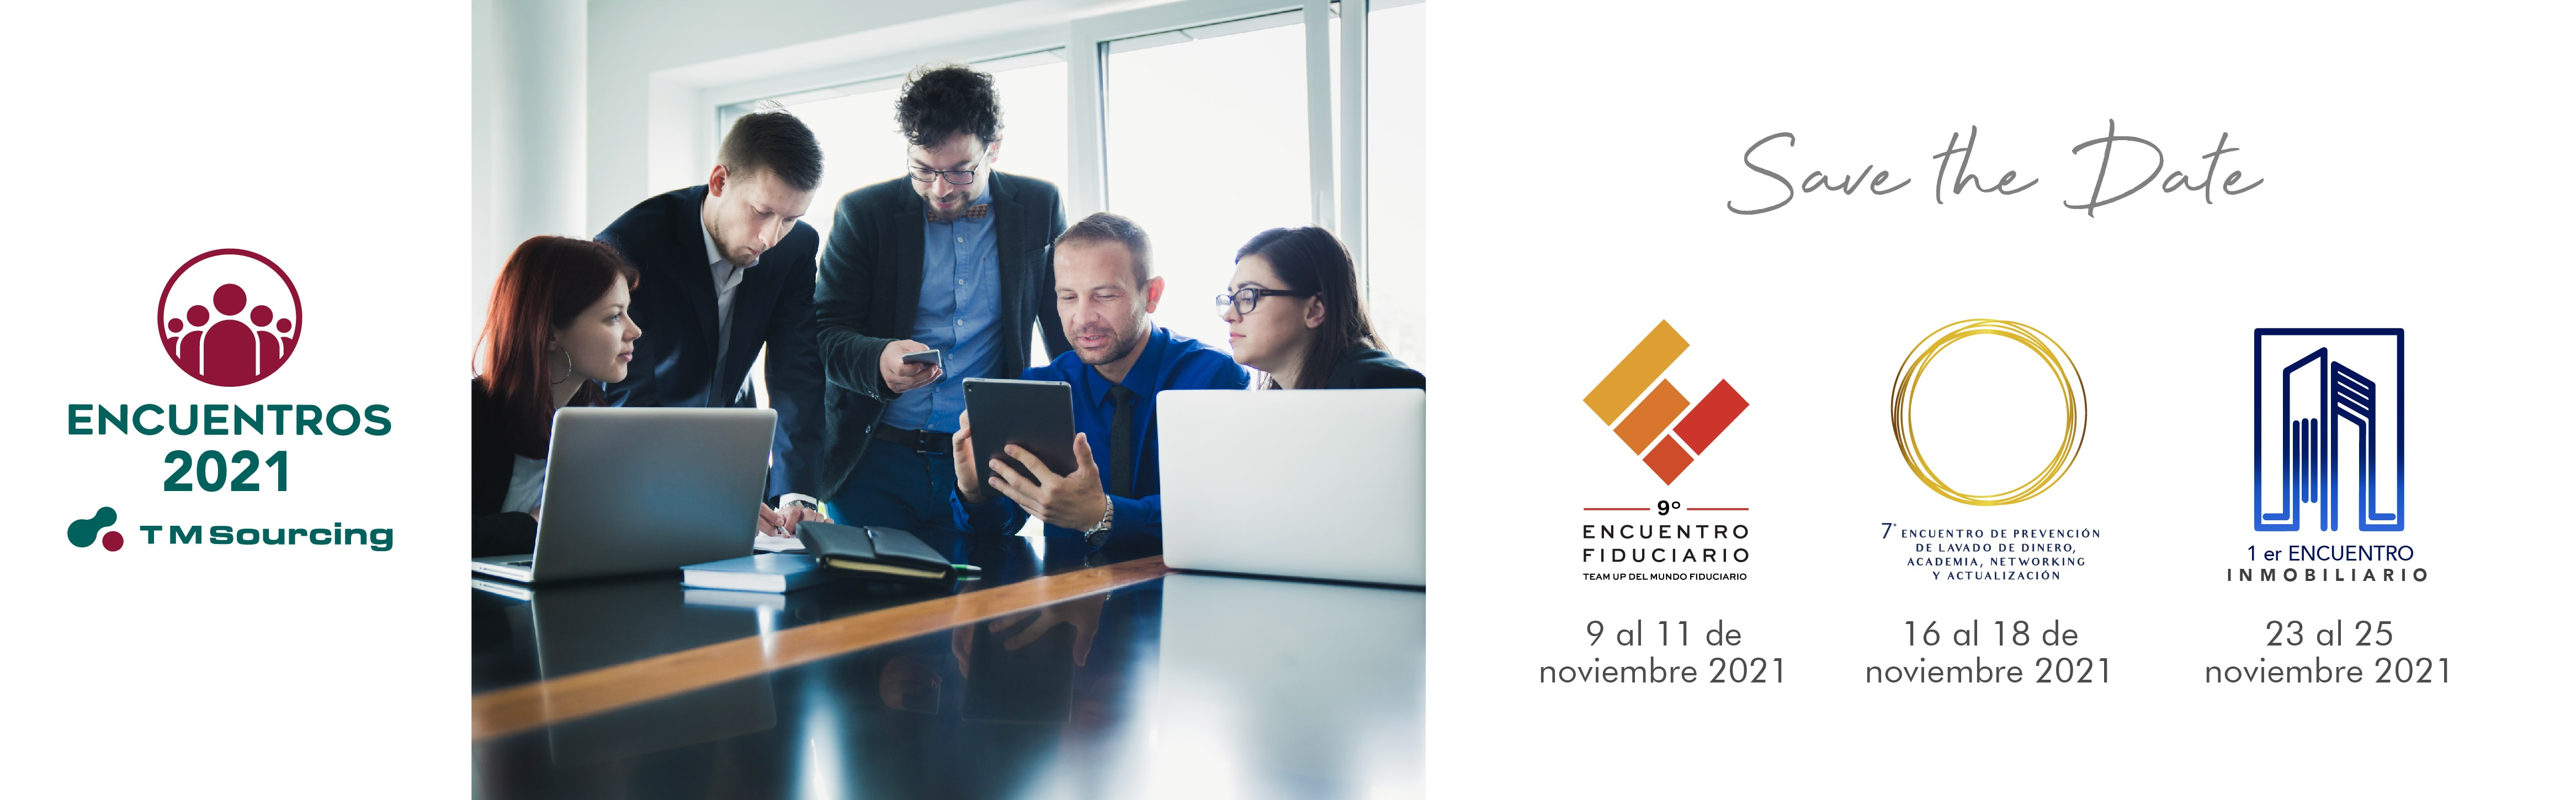 TMSourcing - Encuentros-1